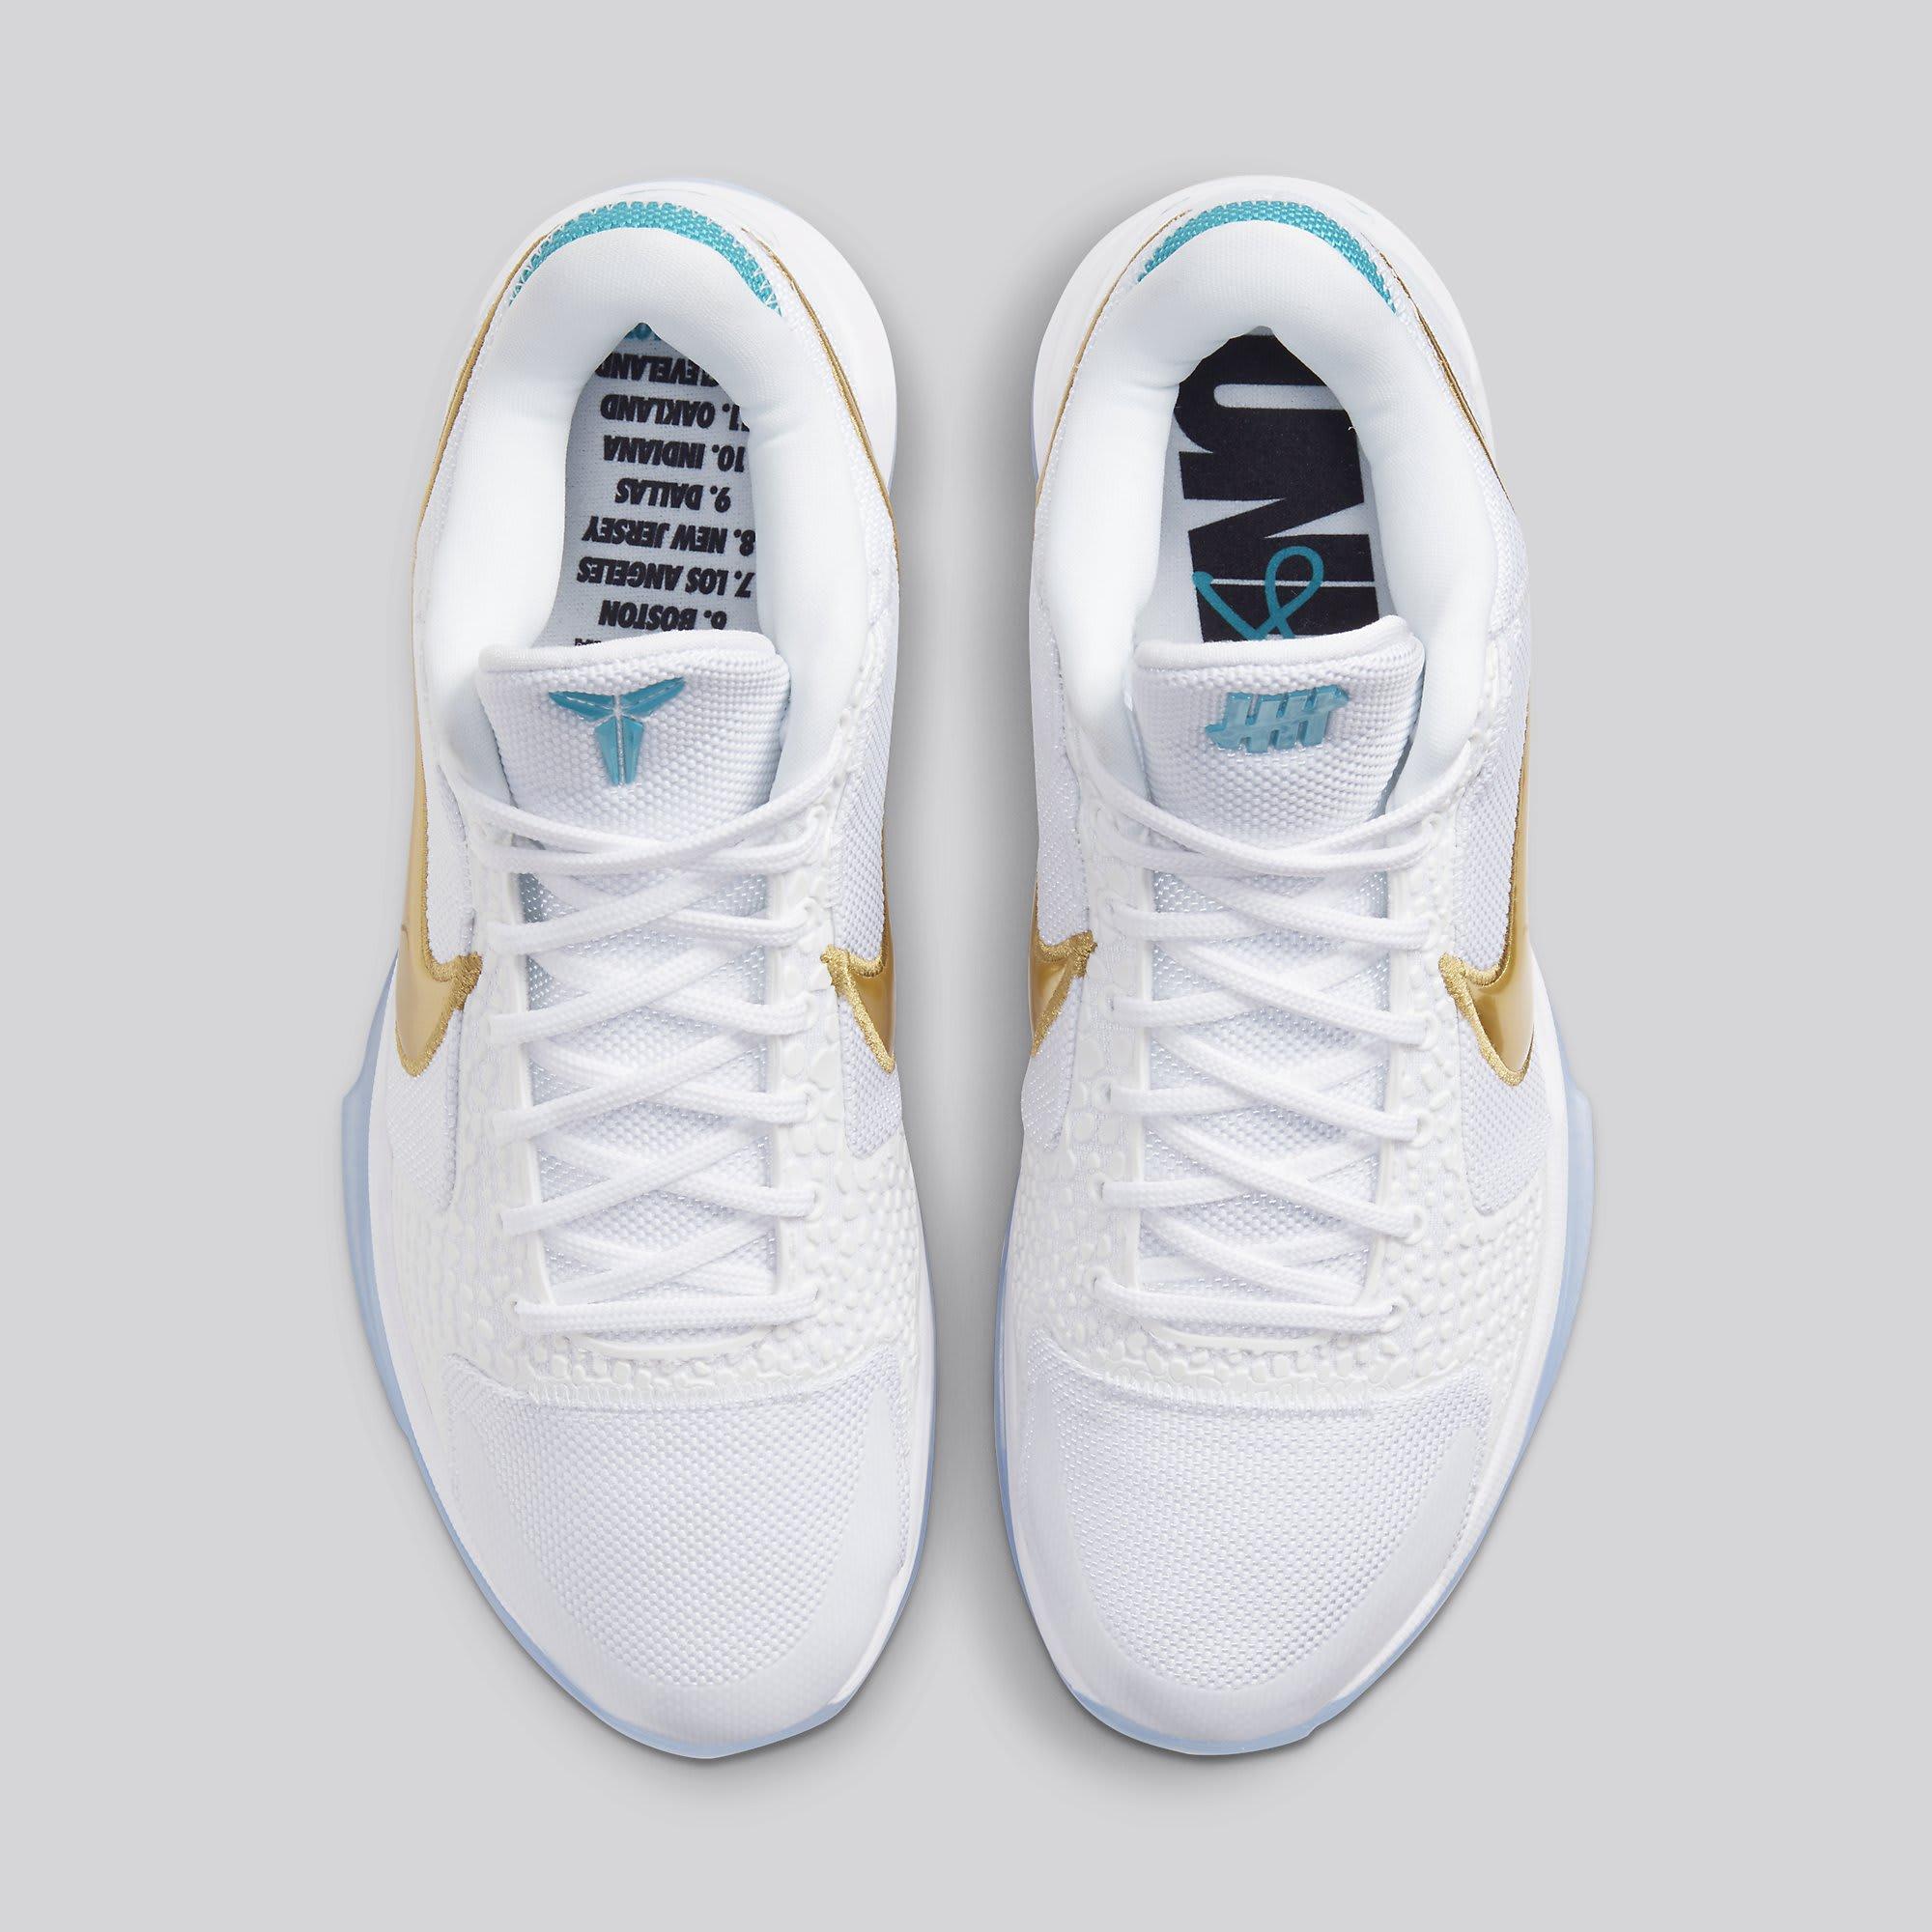 Undefeated x Nike Kobe 5 Protro 'Unlucky 13' DB5551-900 Top